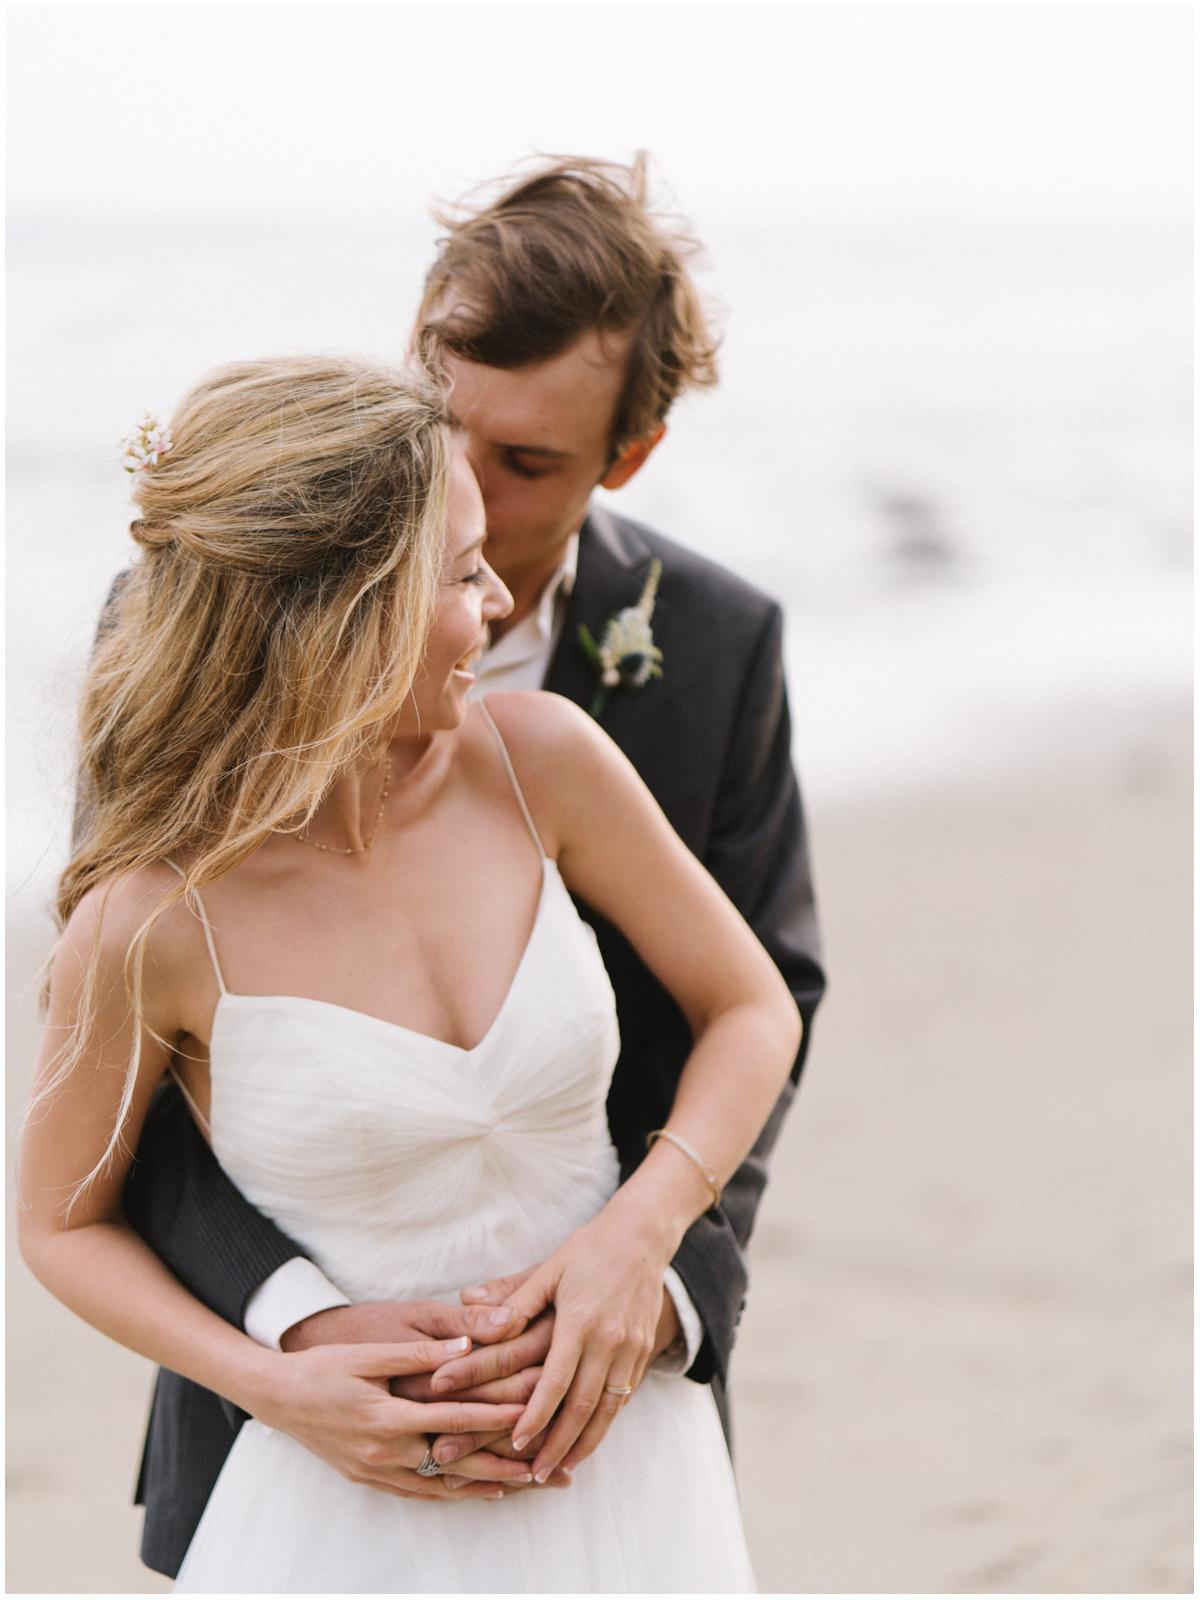 Santa Babara Elopement Wedding Photographer - Pinnel Photography-01-21.jpg